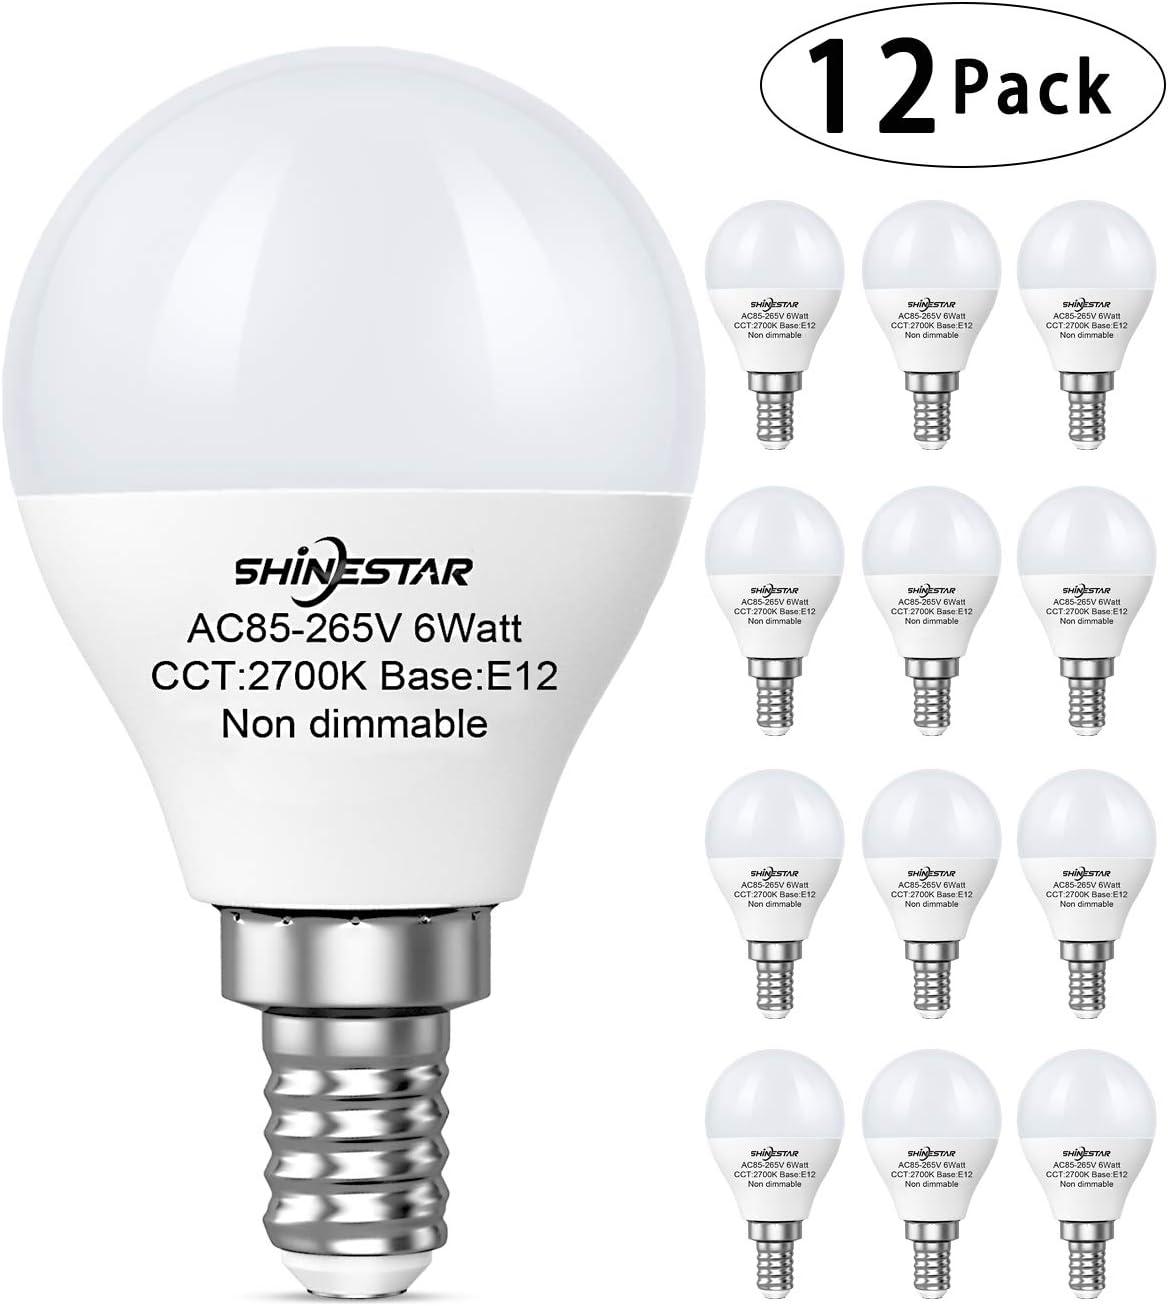 12-Pack E12 LED Light Bulbs for Ceiling Fan, 60W Equivalent Warm White A15 Candelabra LED Bulbs Vanity, Small LED Light Bulbs, Non-dimmable